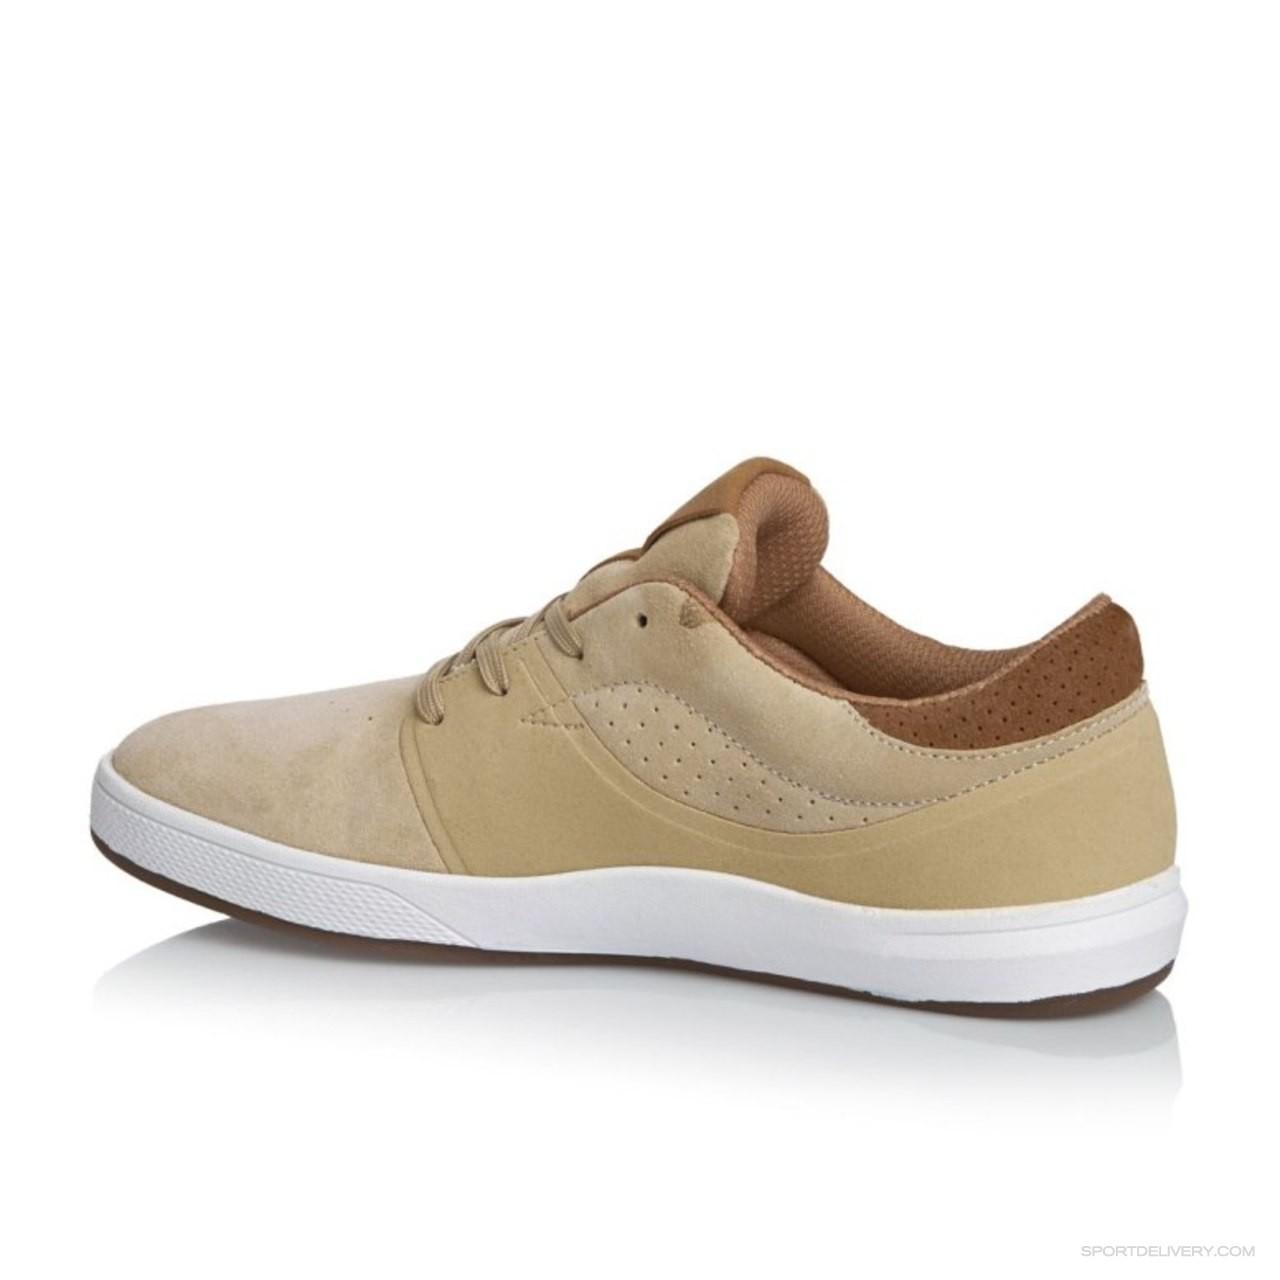 Globe Mahalo SG - men's shoes - Sport